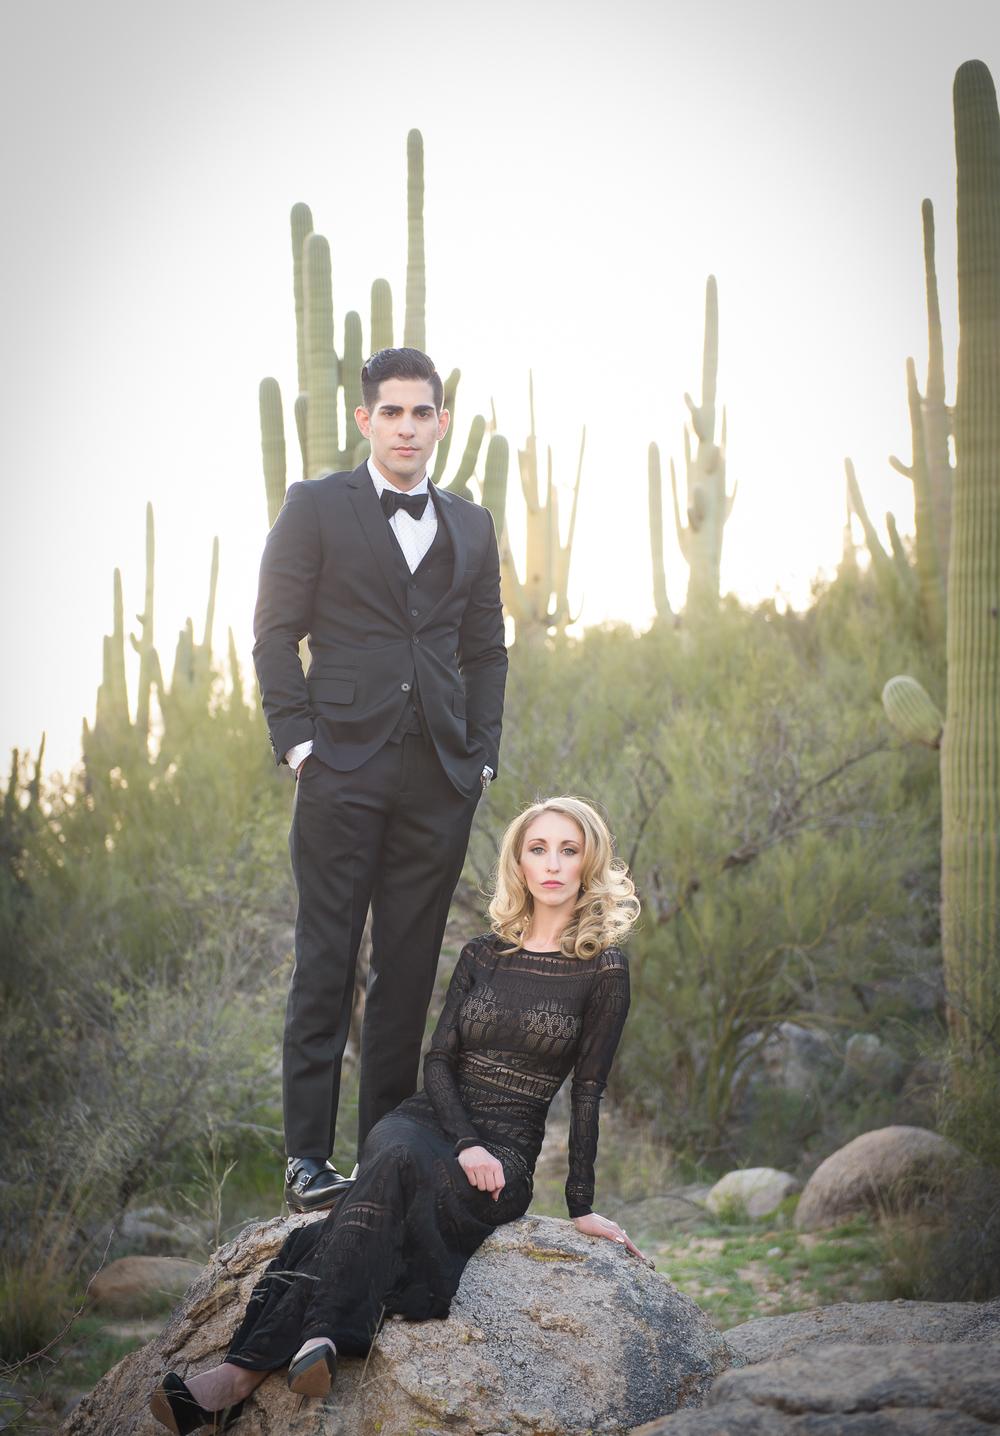 tucson-engagement-fromal-black-tie-desert-saguaro-cactus.jpg